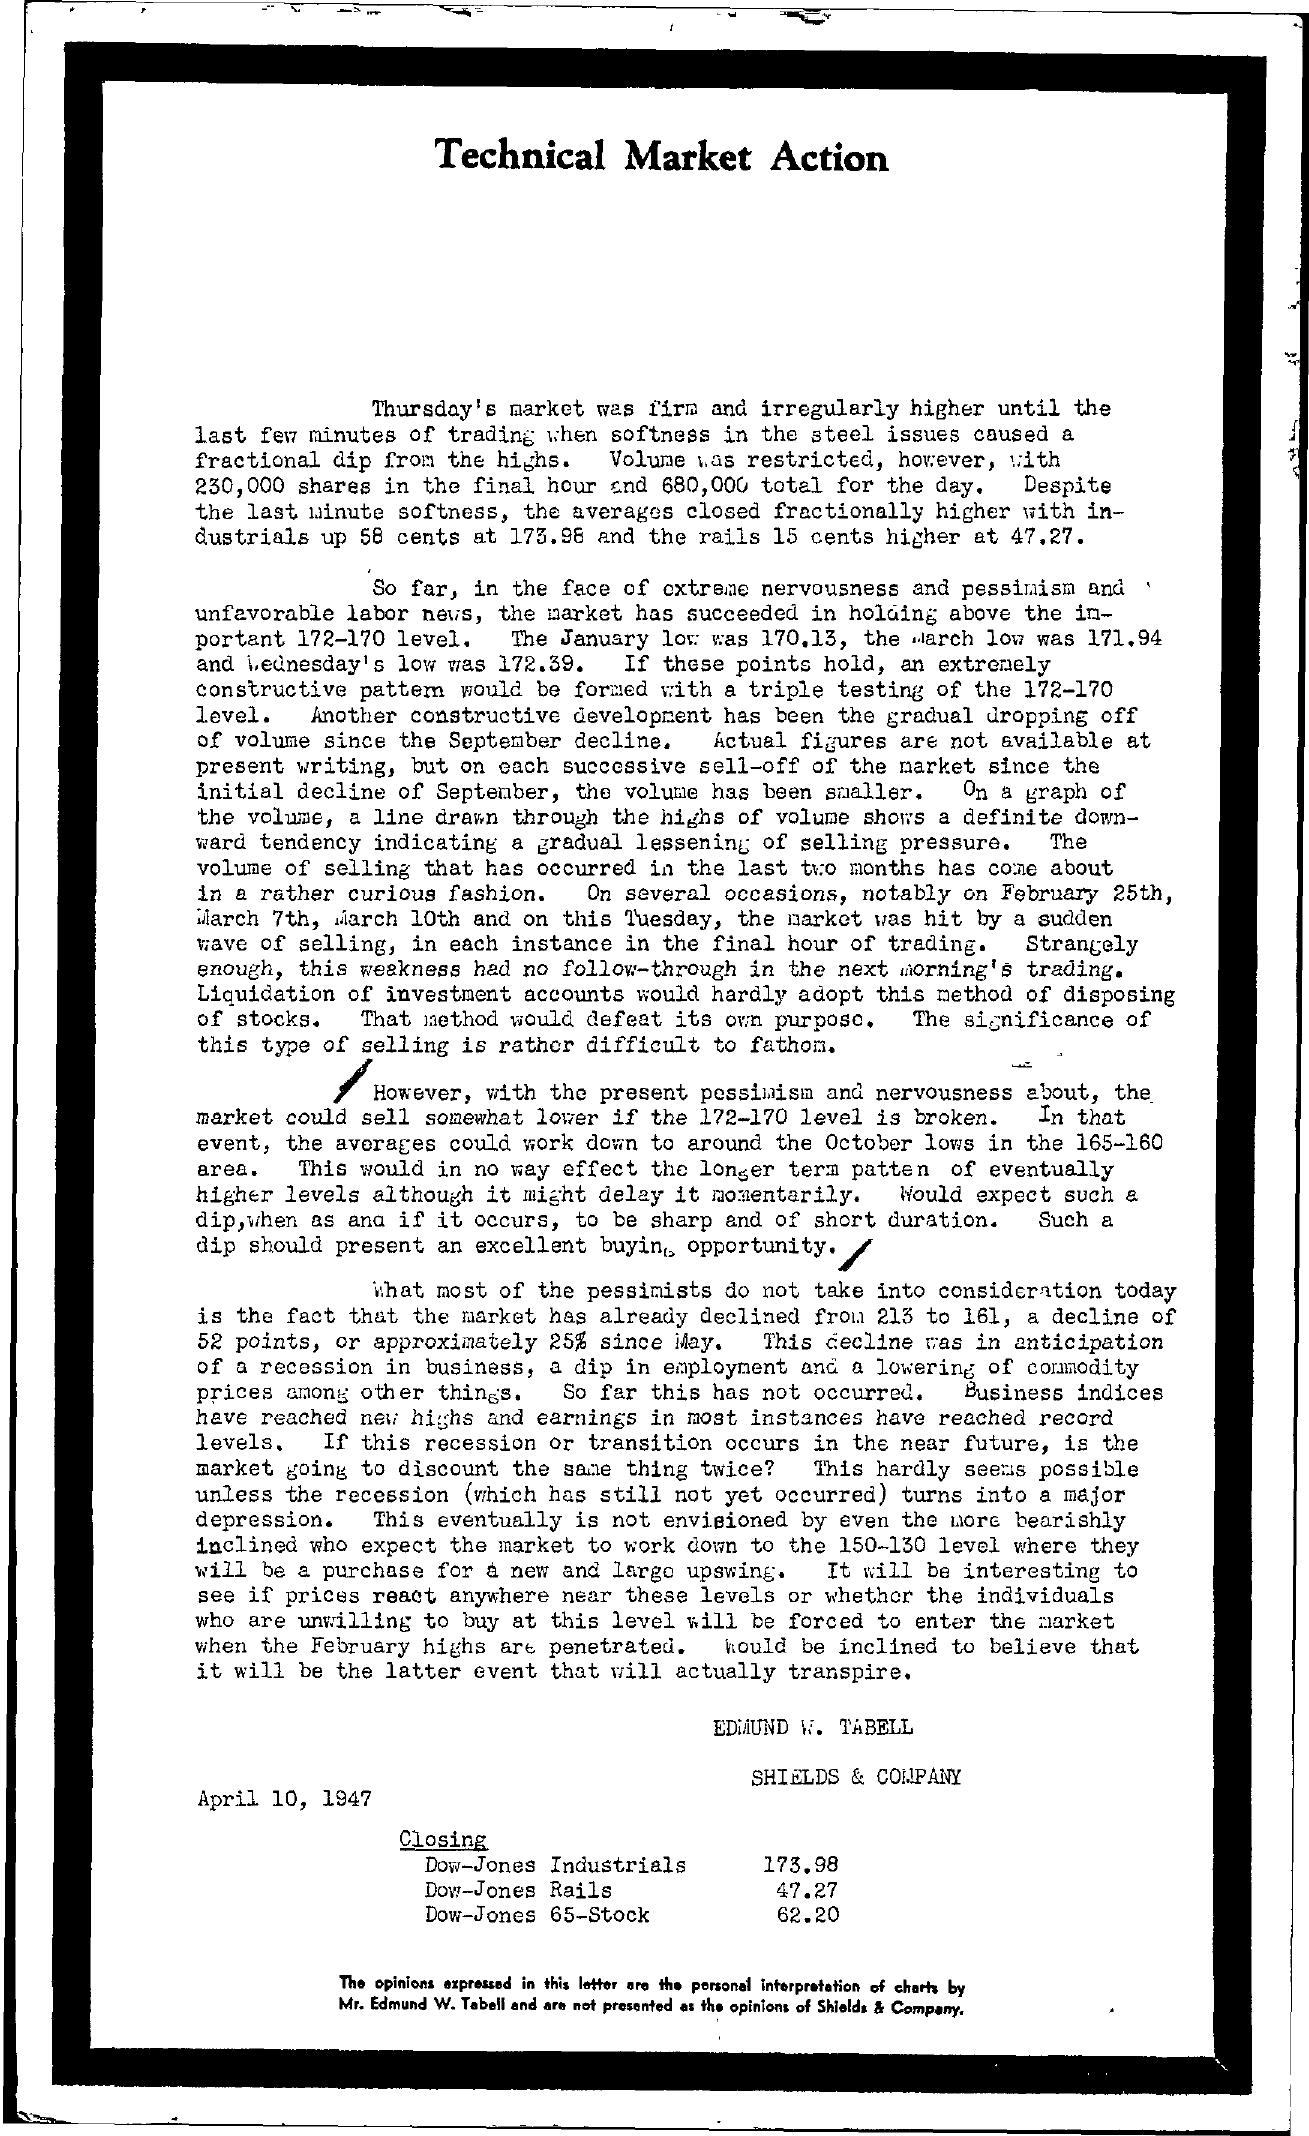 Tabell's Market Letter - April 10, 1947